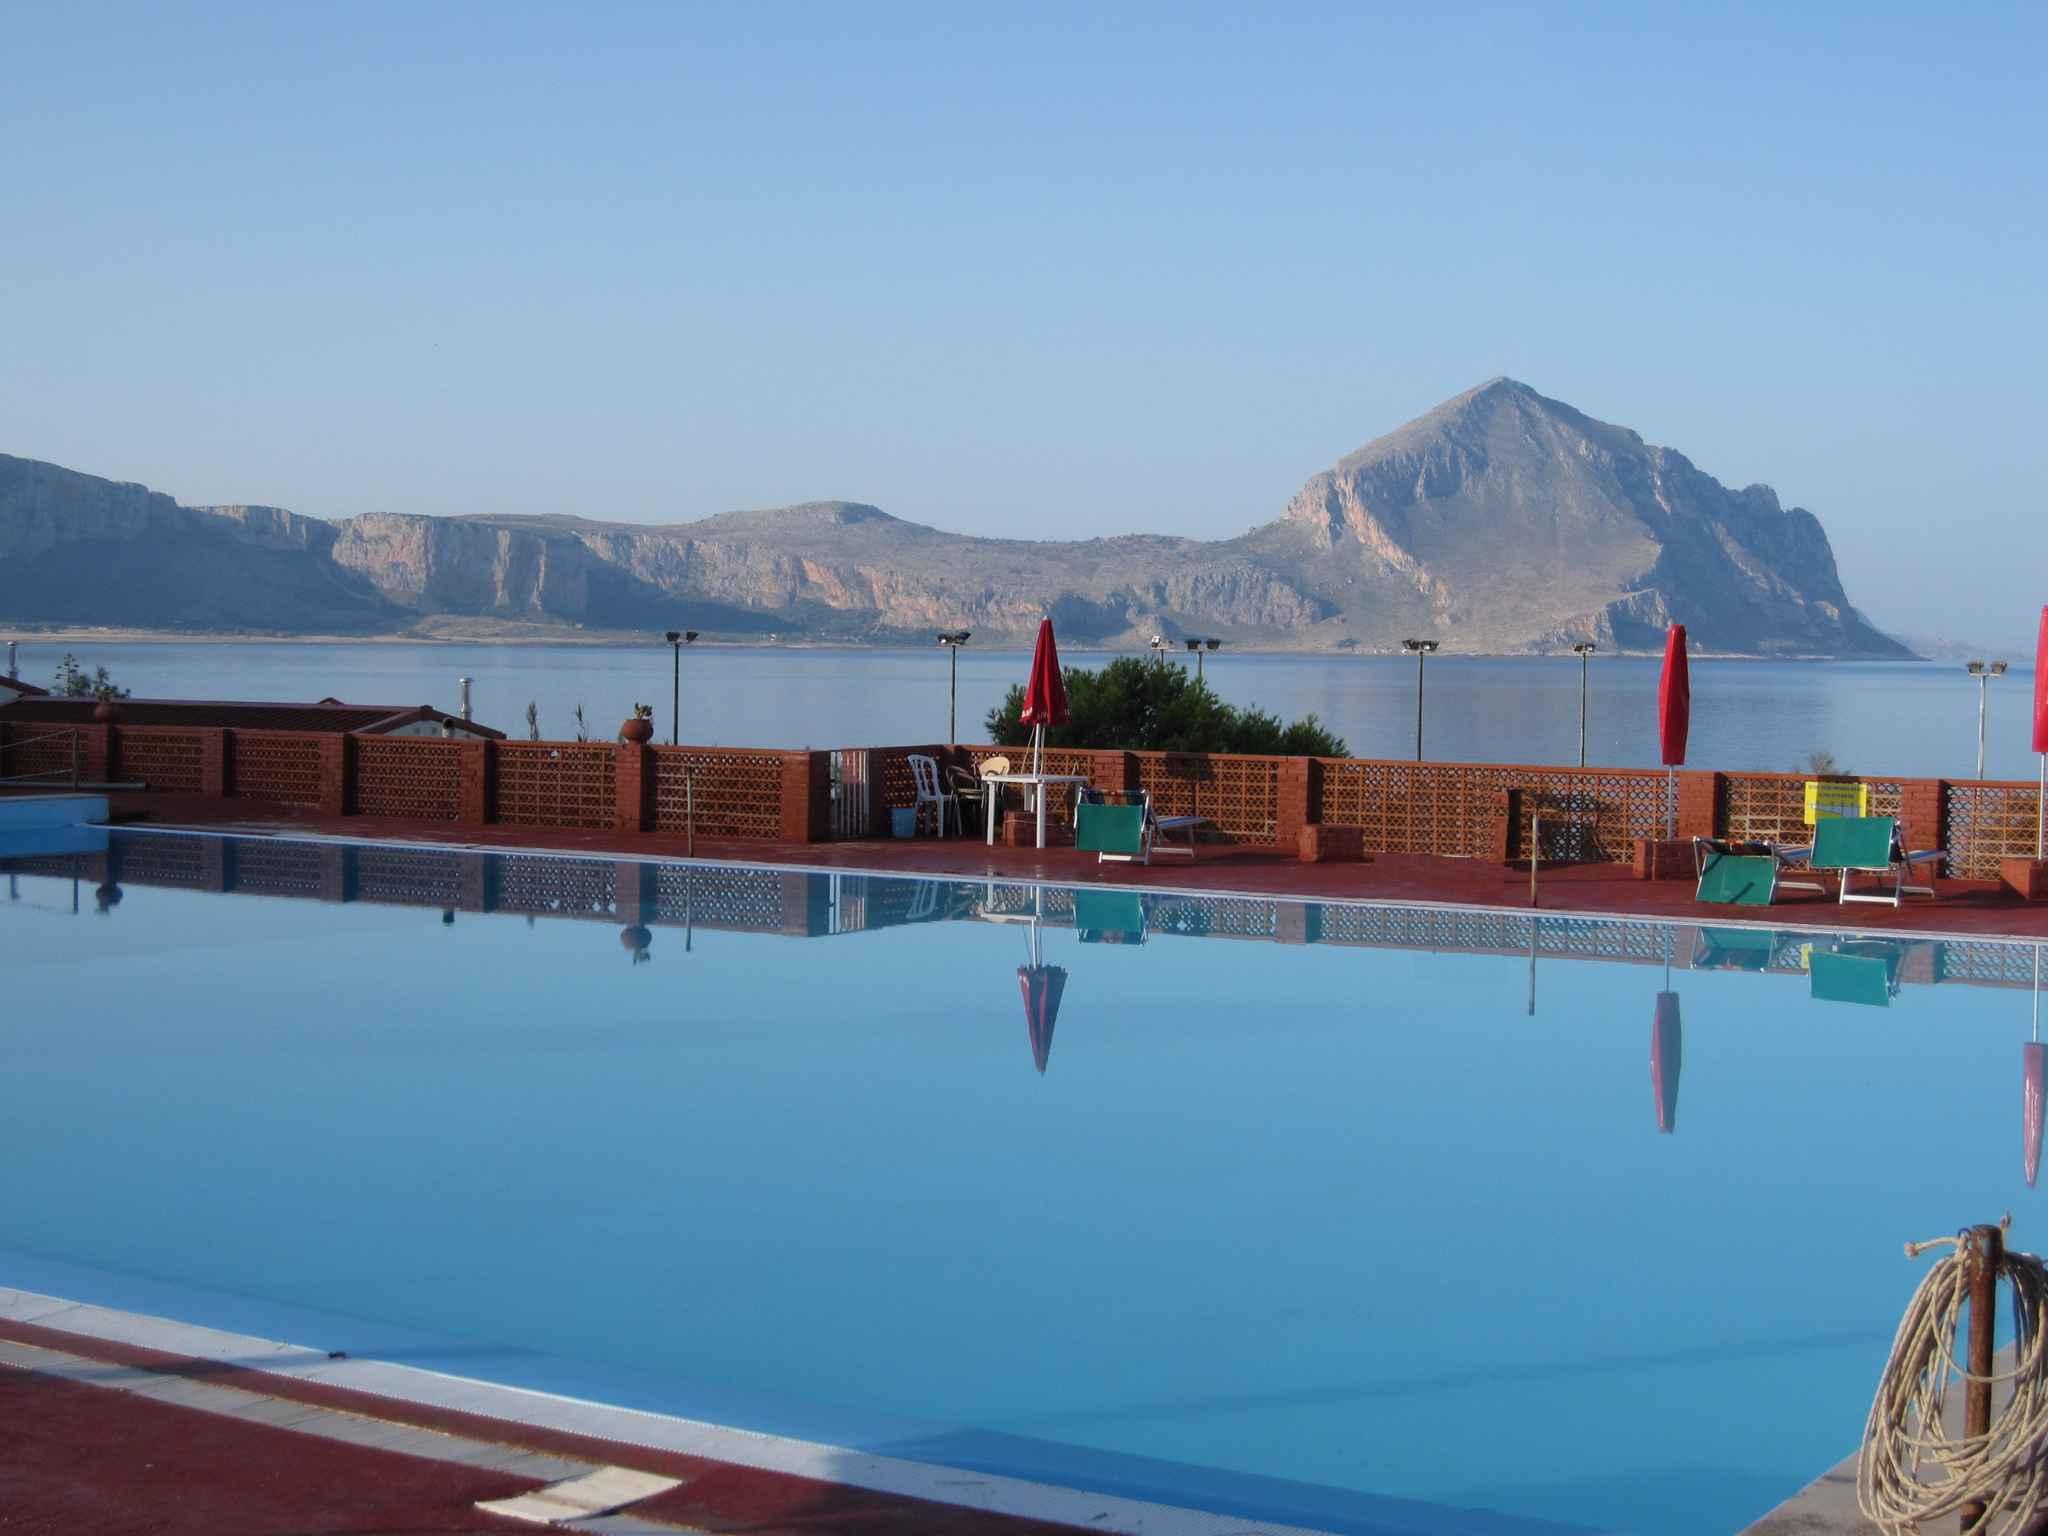 Appartement de vacances Mobilehome mit Tischtennis und Fahrradverleih (2483443), San Vito Lo Capo, Trapani, Sicile, Italie, image 6